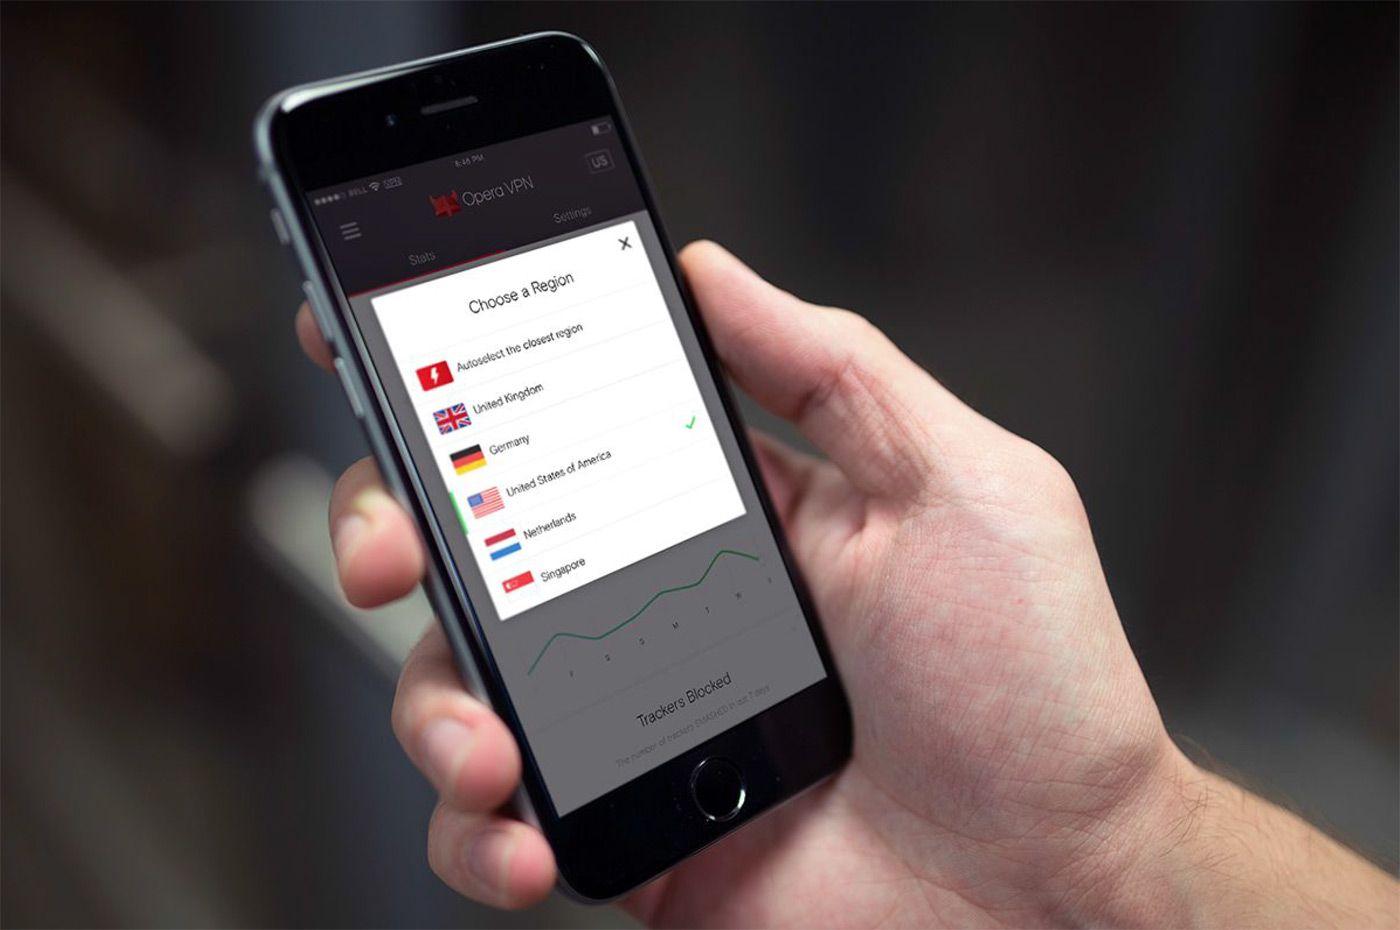 798f46b3cd8cbc1443f4695d6fd6d824 - How To Use Opera Vpn On Iphone